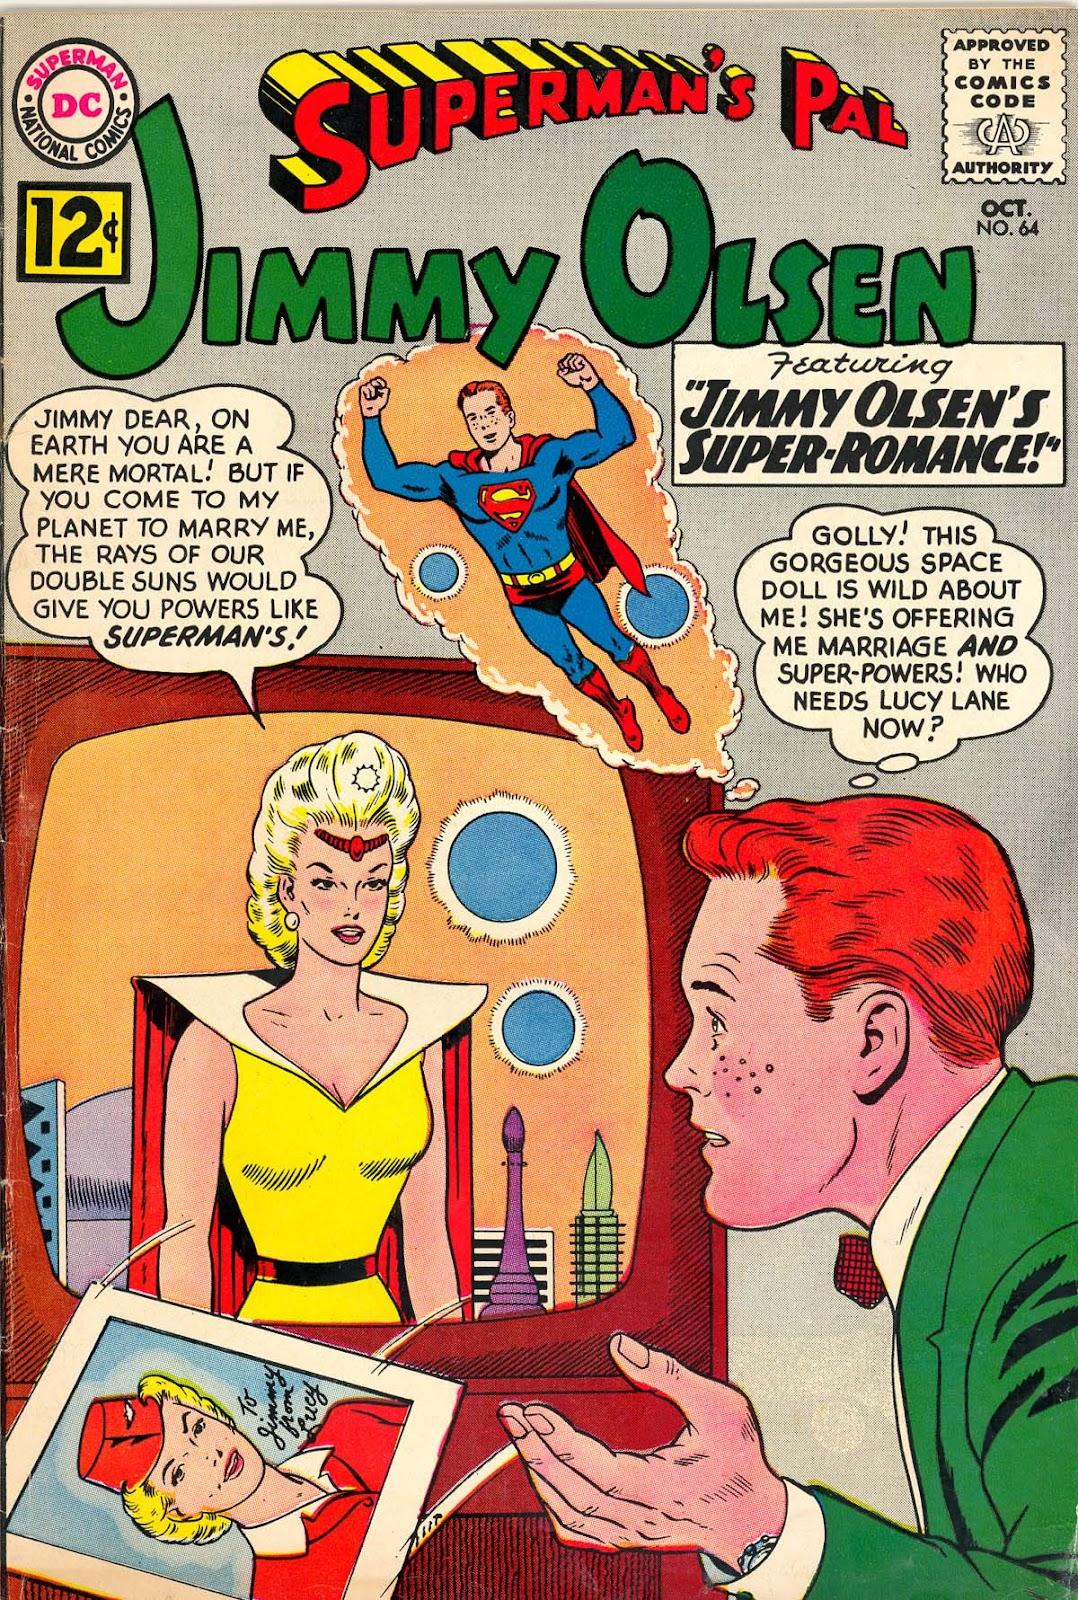 Supermans Pal Jimmy Olsen (1954) 64 Page 1